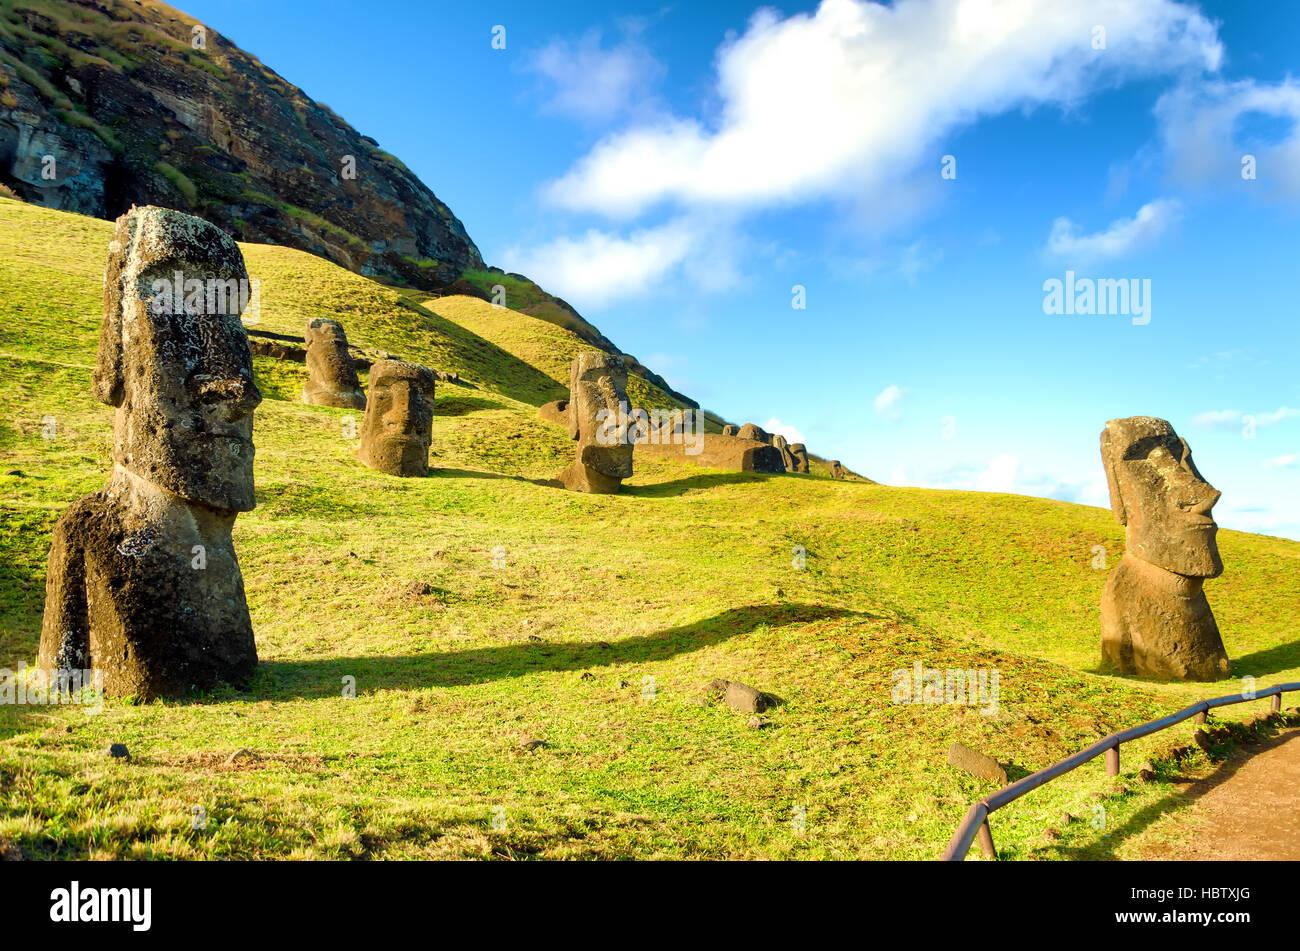 Moai de piedra en la Isla de Pascua en Rano Raraku en Chile Imagen De Stock